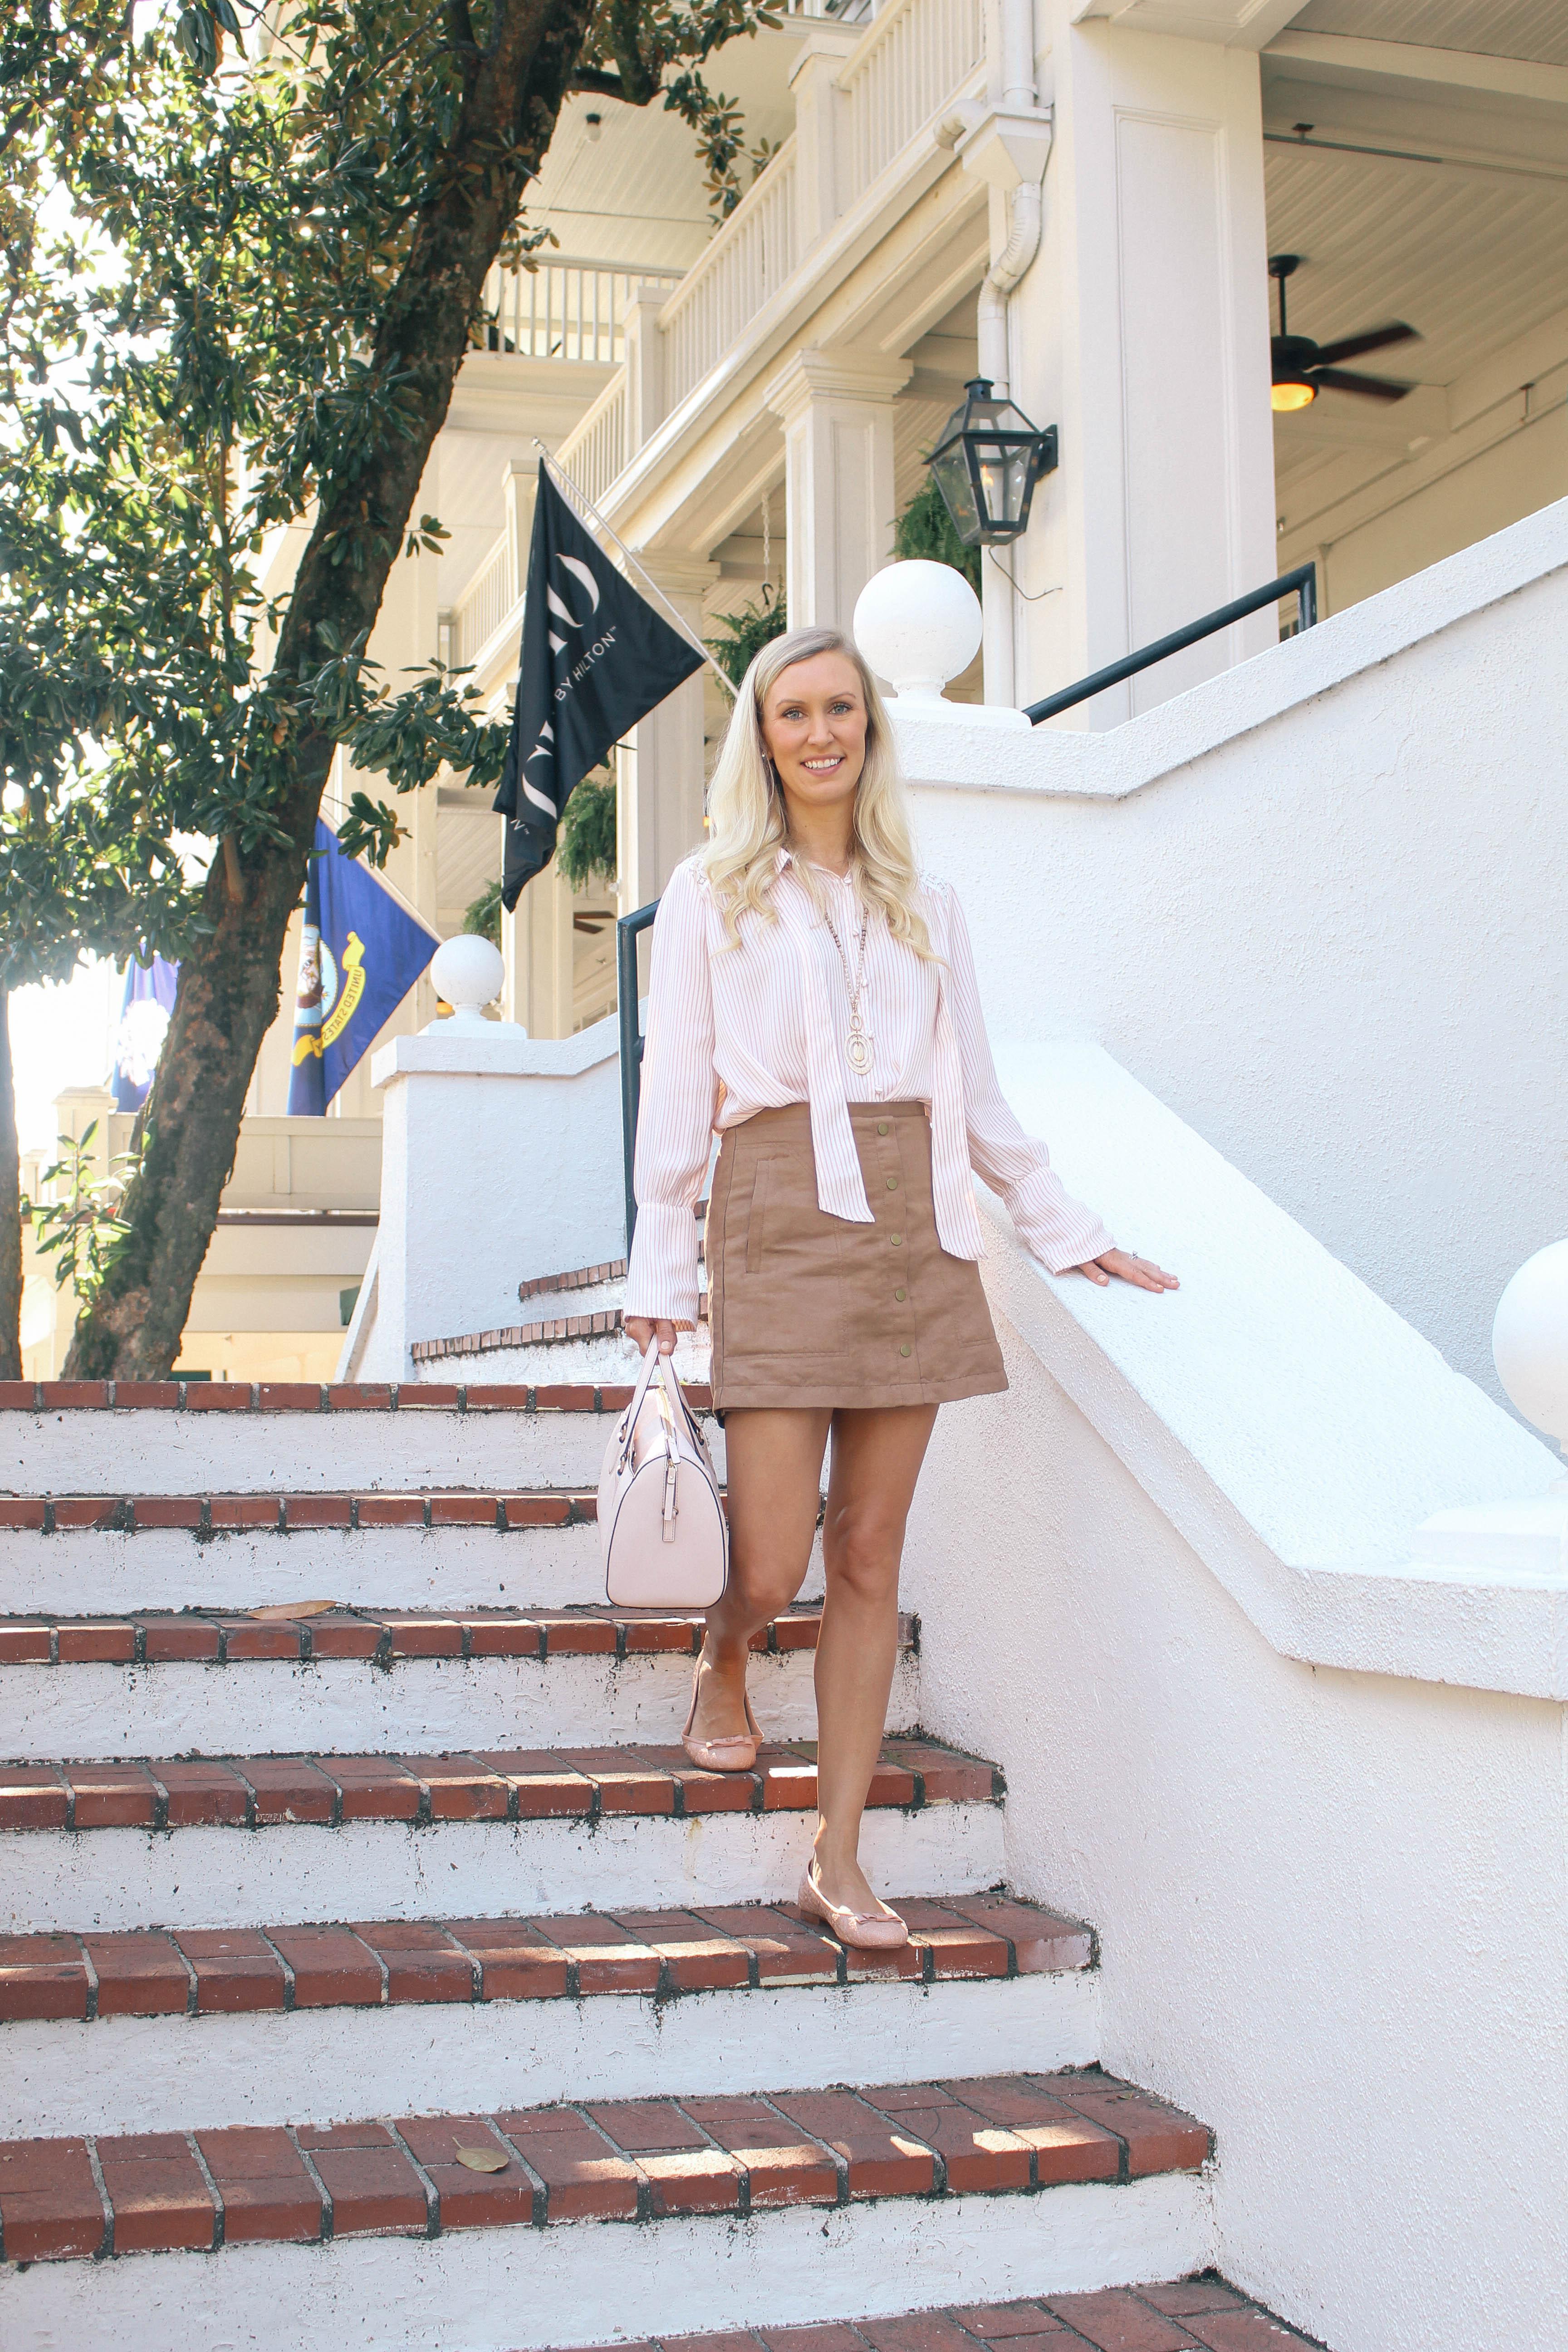 The-Partridge-Inn-Augusta-Georgia-Review-top-atlanta-blogger-6